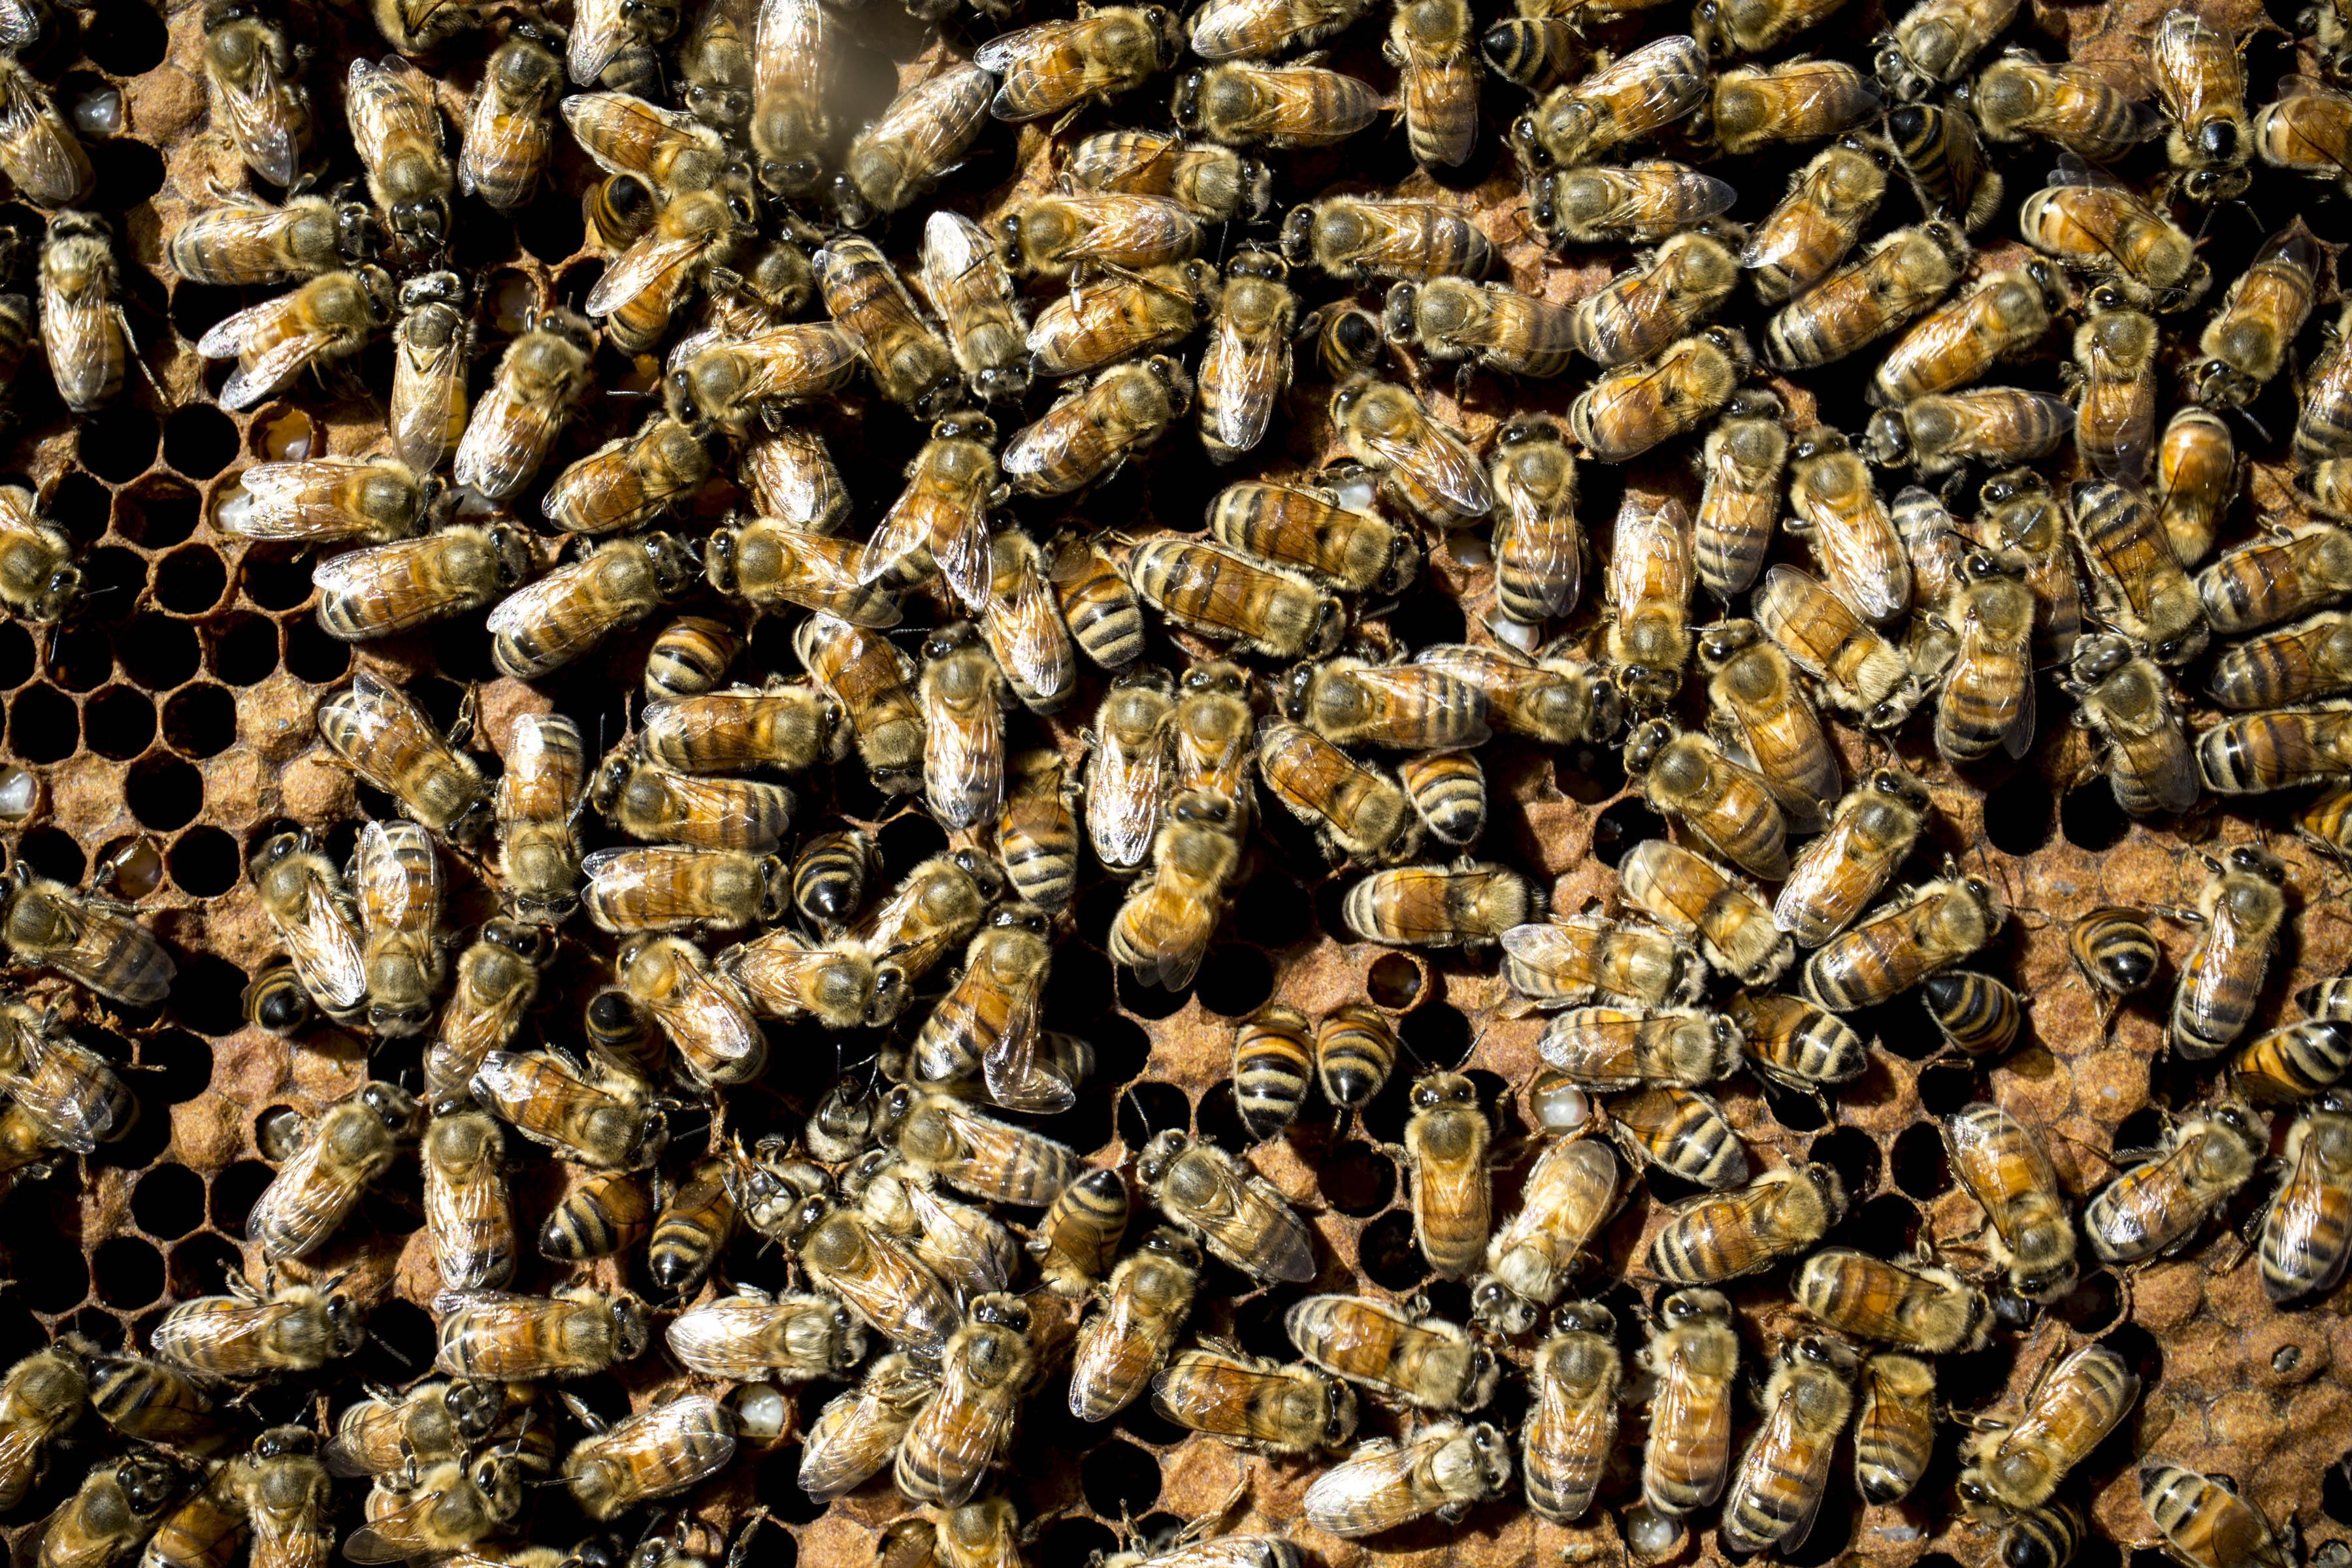 Arizona hiker killed by bees